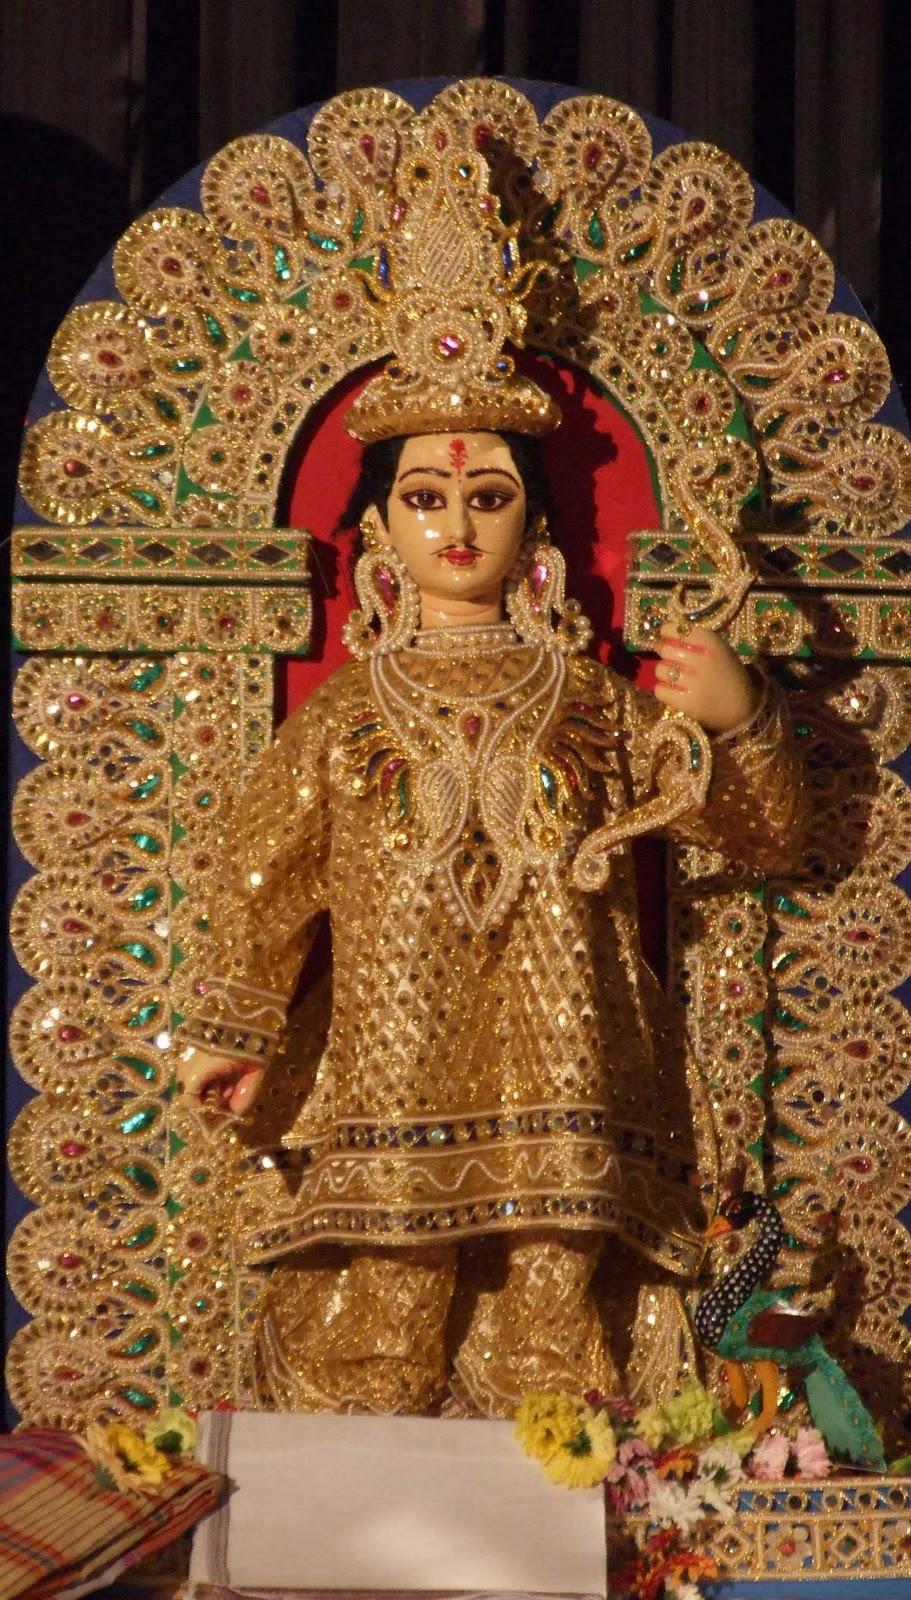 essay on durga puja Essays on durga puja in hindi durga puja or sharadotsav is an annual hindu festival in south asia that celebrates worship of the hindu goddess durgait refers to all the six days observed as mahalaya, shashthi, maha saptami, maha ashtami, maha navami and vijayadashami.